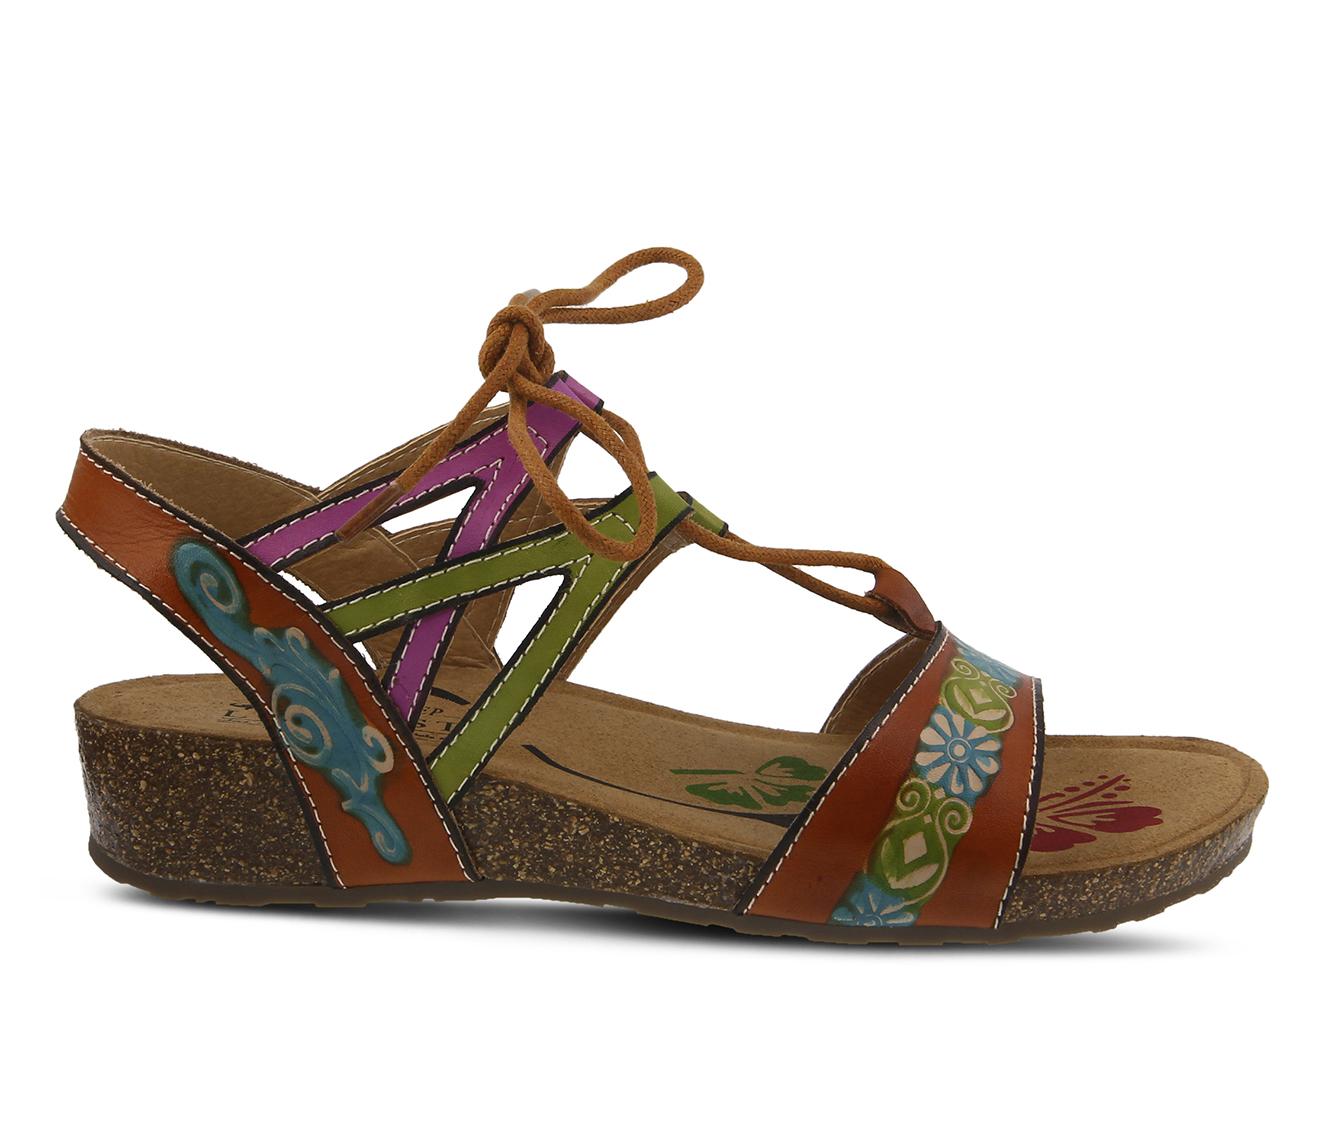 L'Artiste Loma Women's Sandal (Beige Leather)